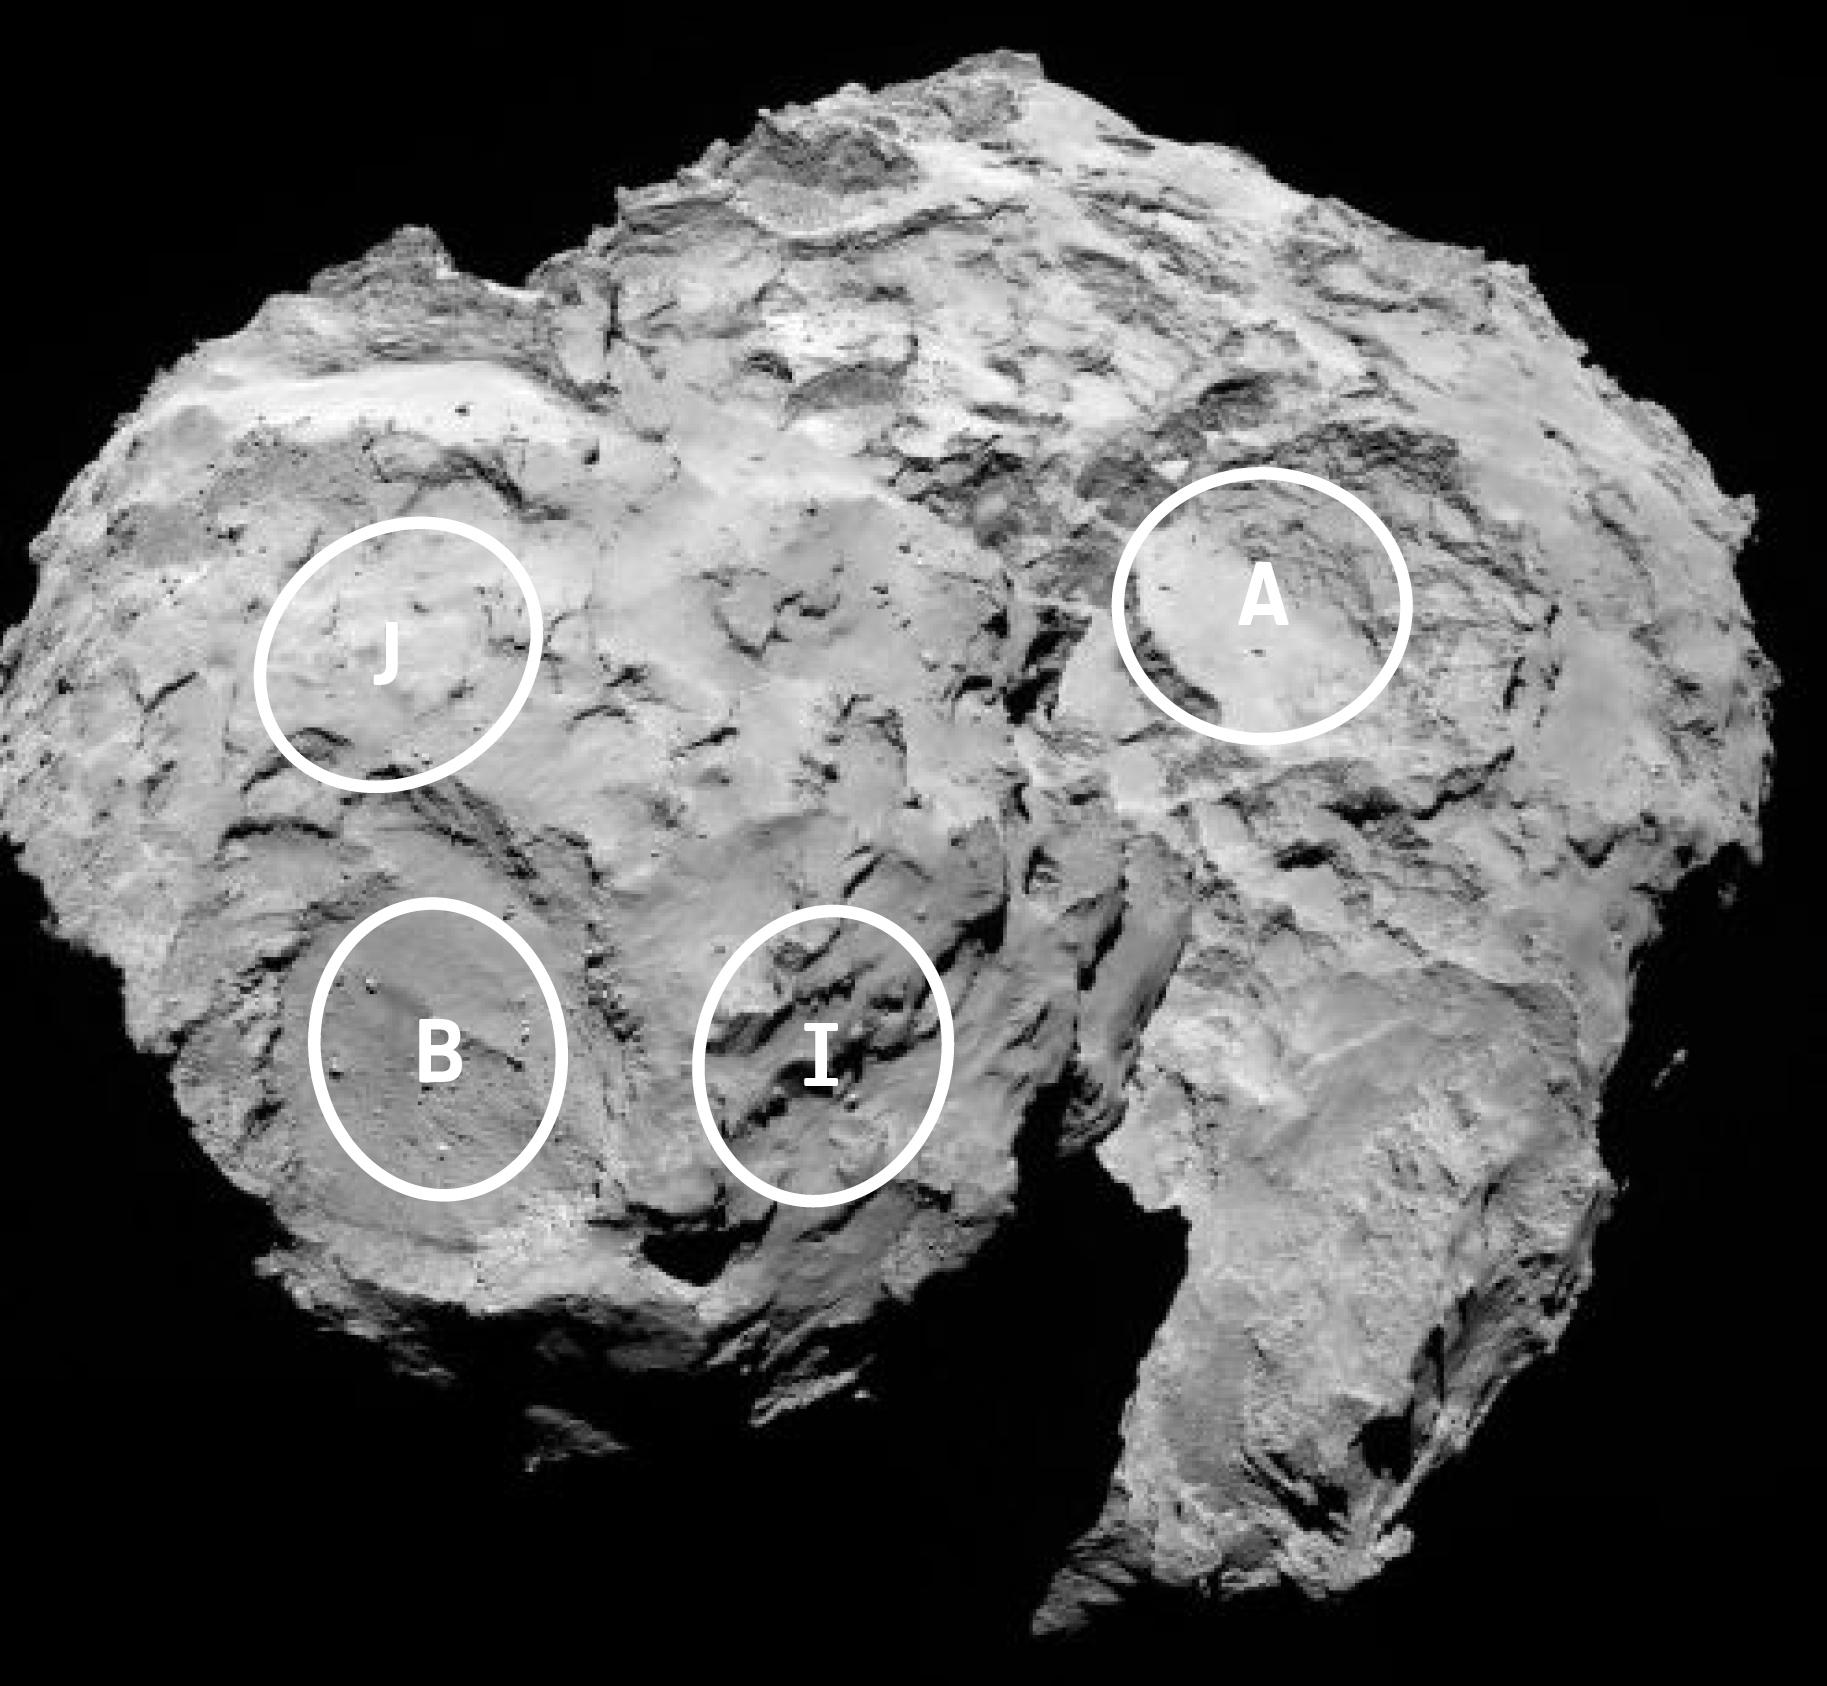 Sonde Rosetta Pia18778_0